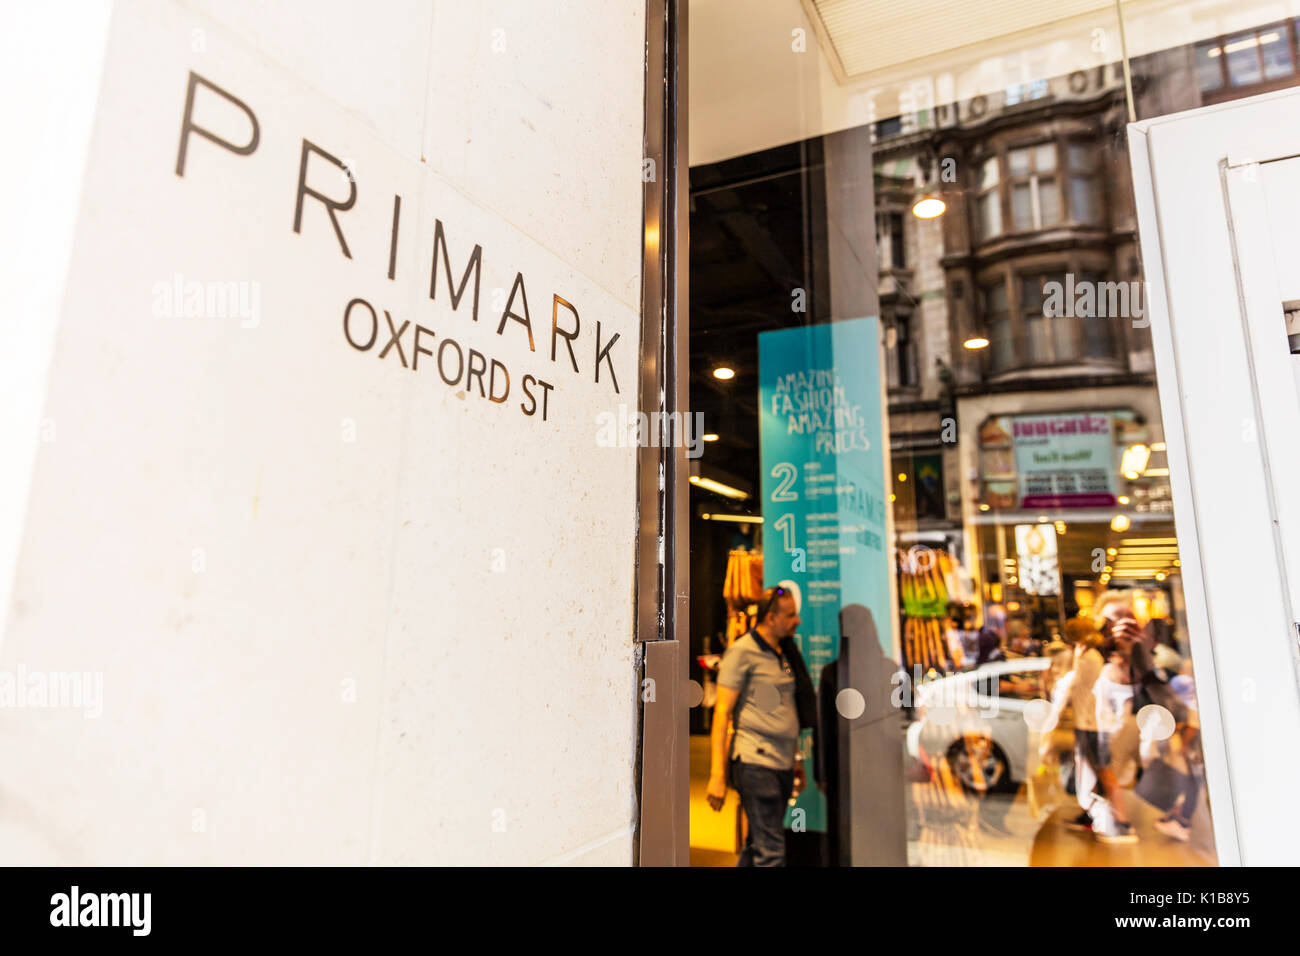 Primark Oxford Street, Primark Oxford Street London UK, Primark discount clothes shop, Primark, Primark UK England, Oxford Street shops, Primark UK - Stock Image